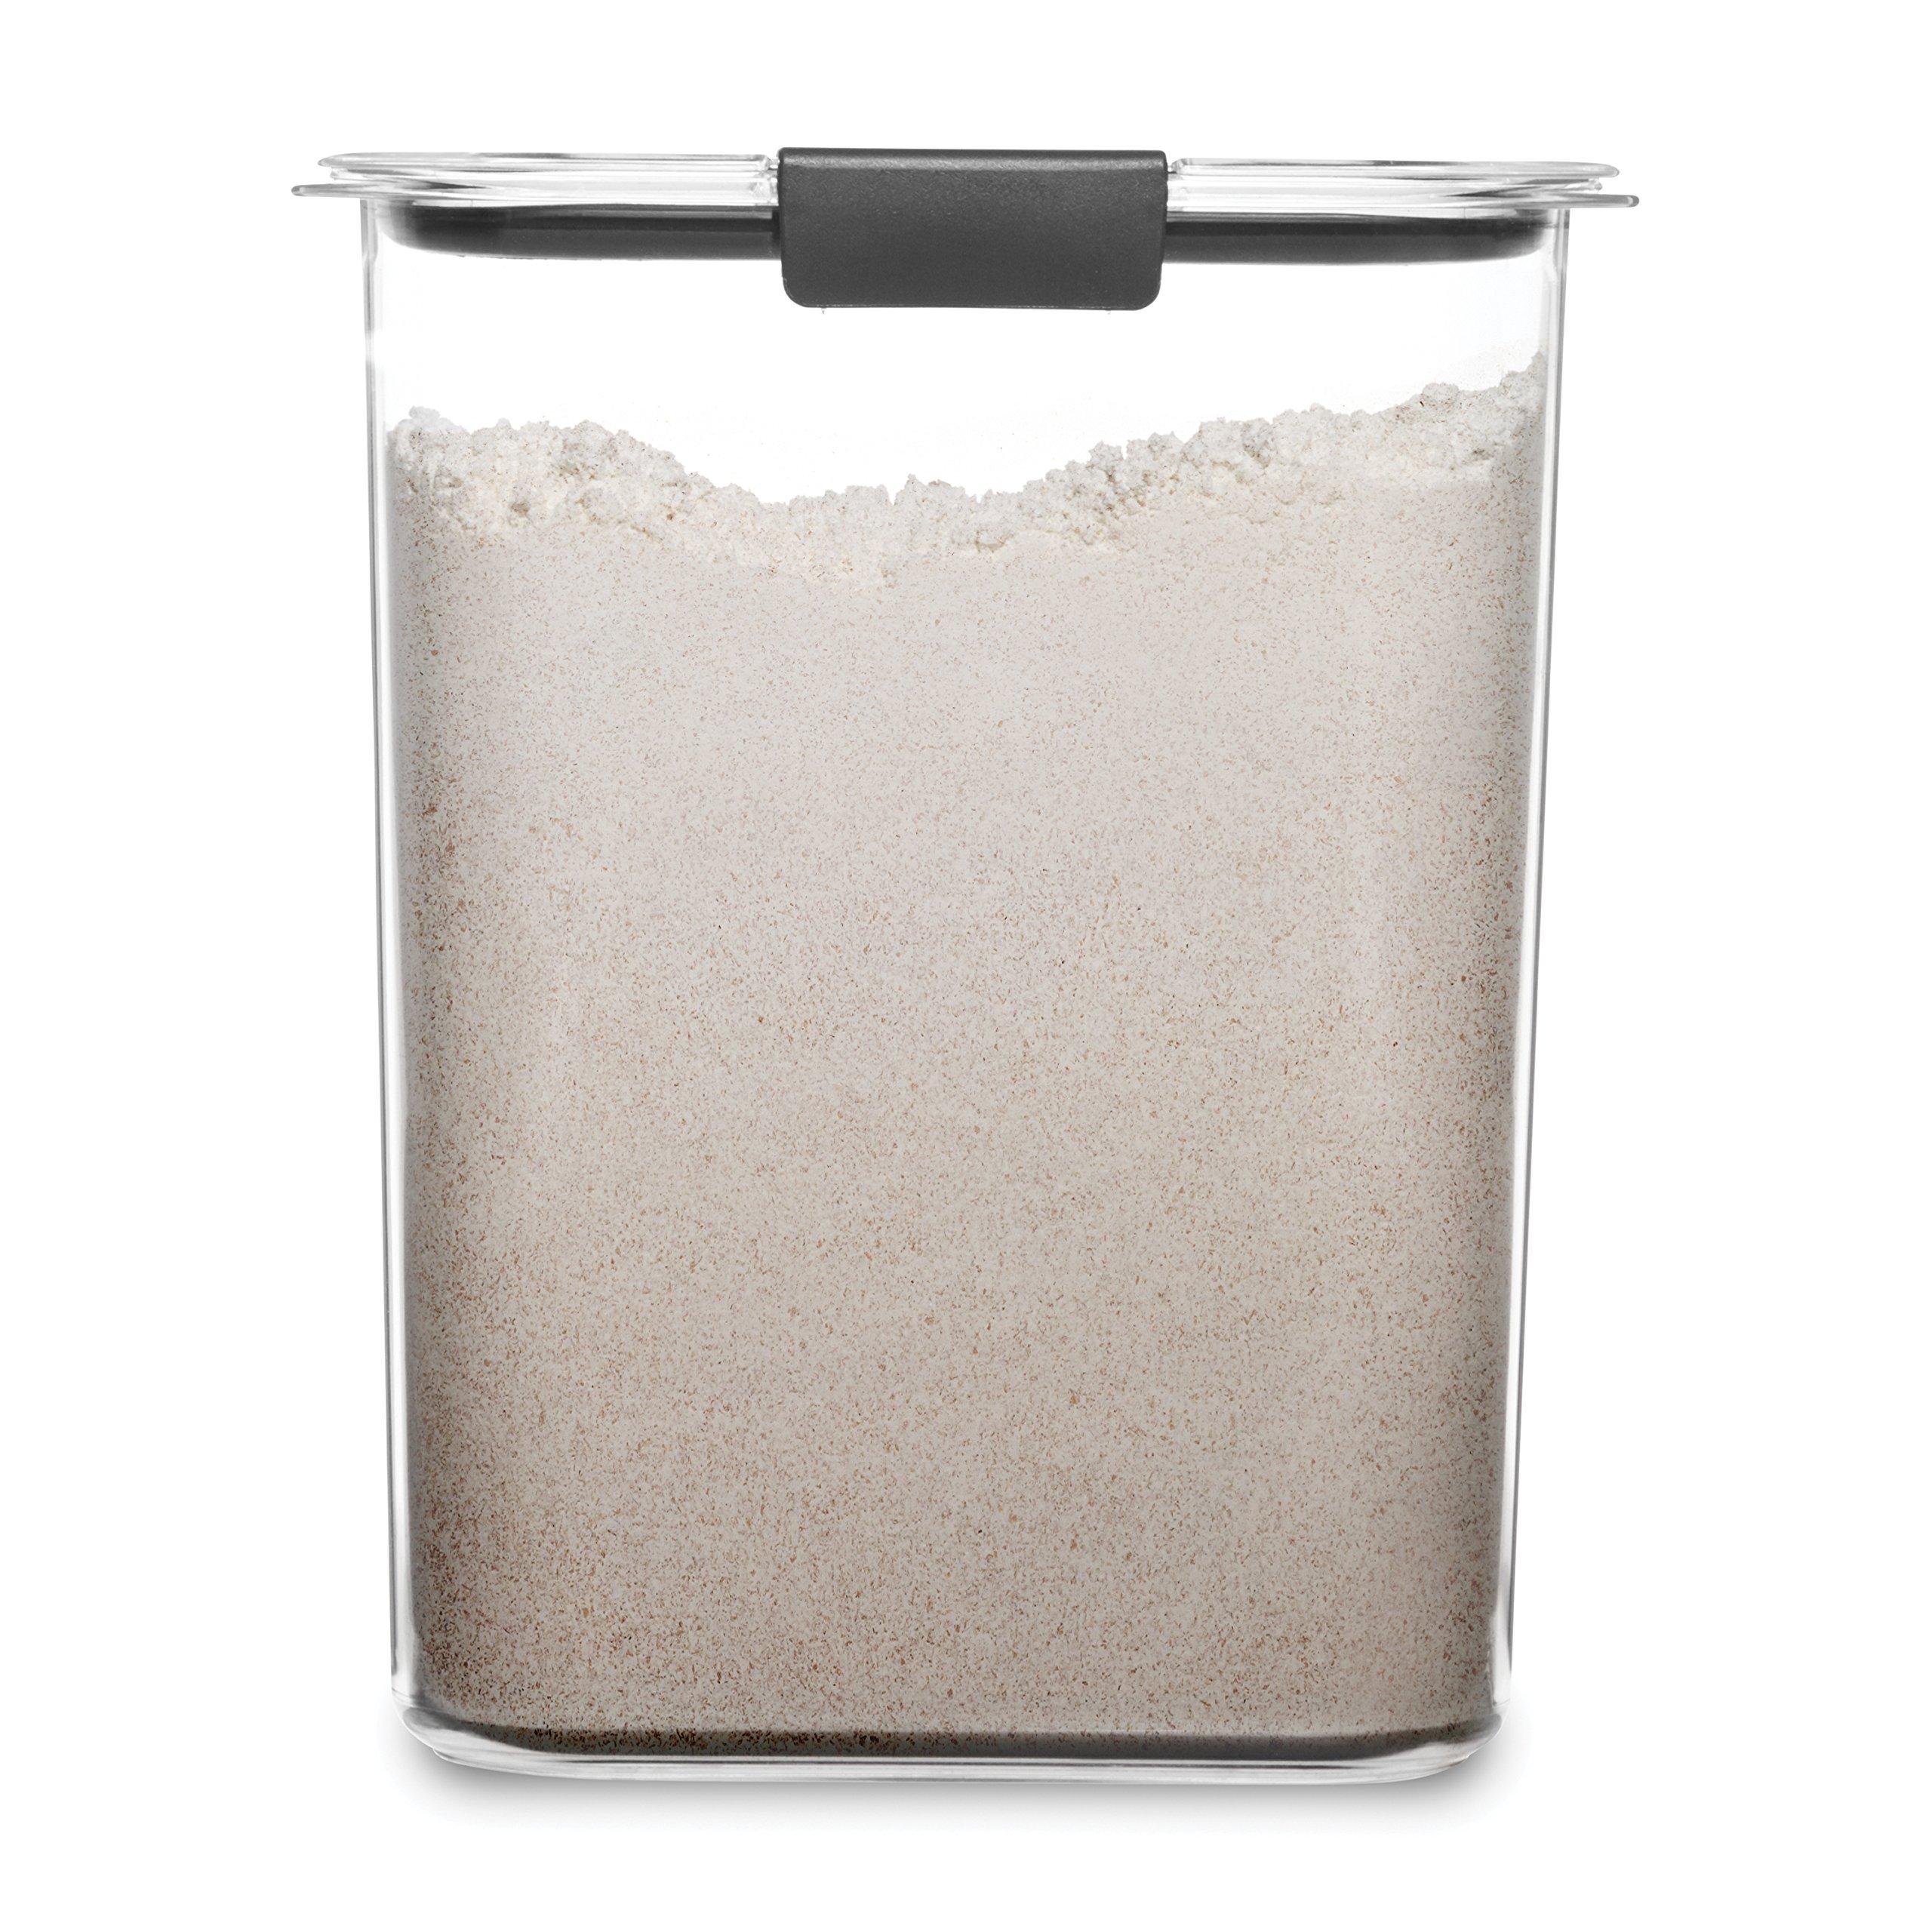 Rubbermaid Brilliance Airtight Container BPA Free